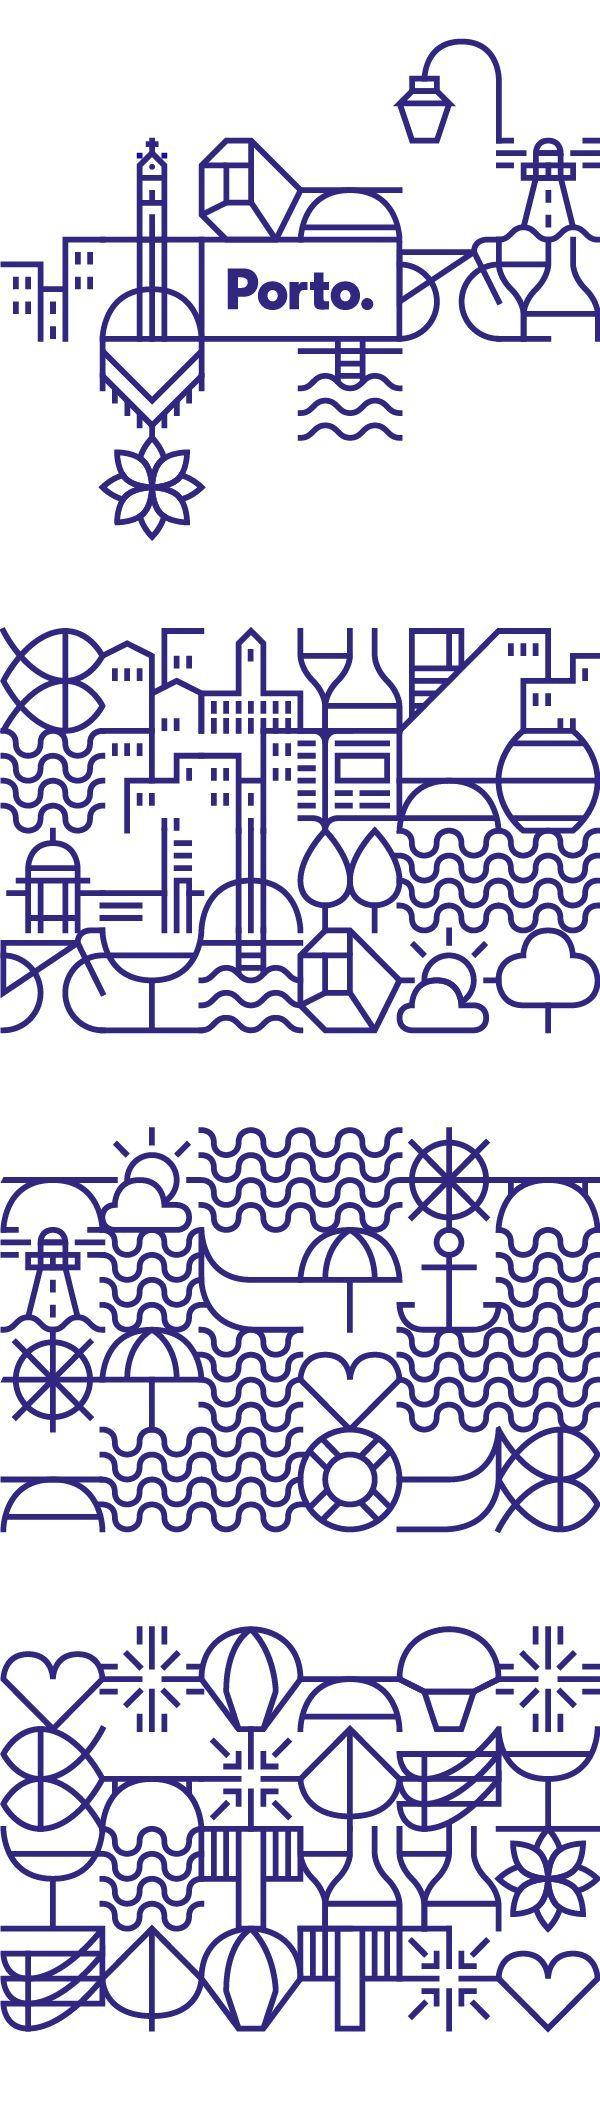 New identity for the city of Porto, Portugal / Branding / Brand Design / Ideas / Inspiration / Line Art / City / Landscapes / Tourism / Modern / Beautiful / Outline / Line / Tiles / City Elements